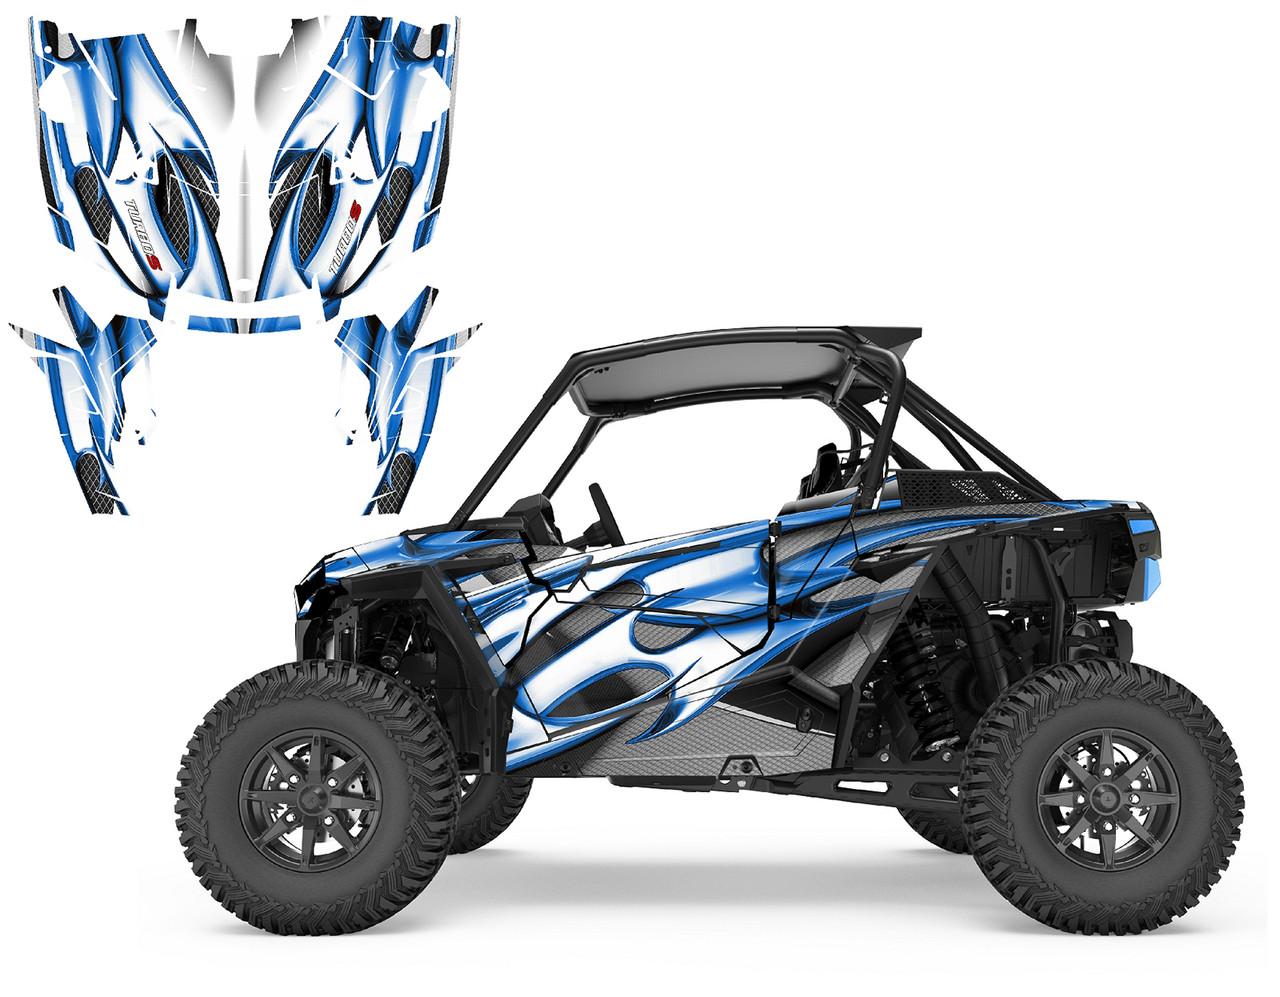 2019 Polaris XP turbo S graphics